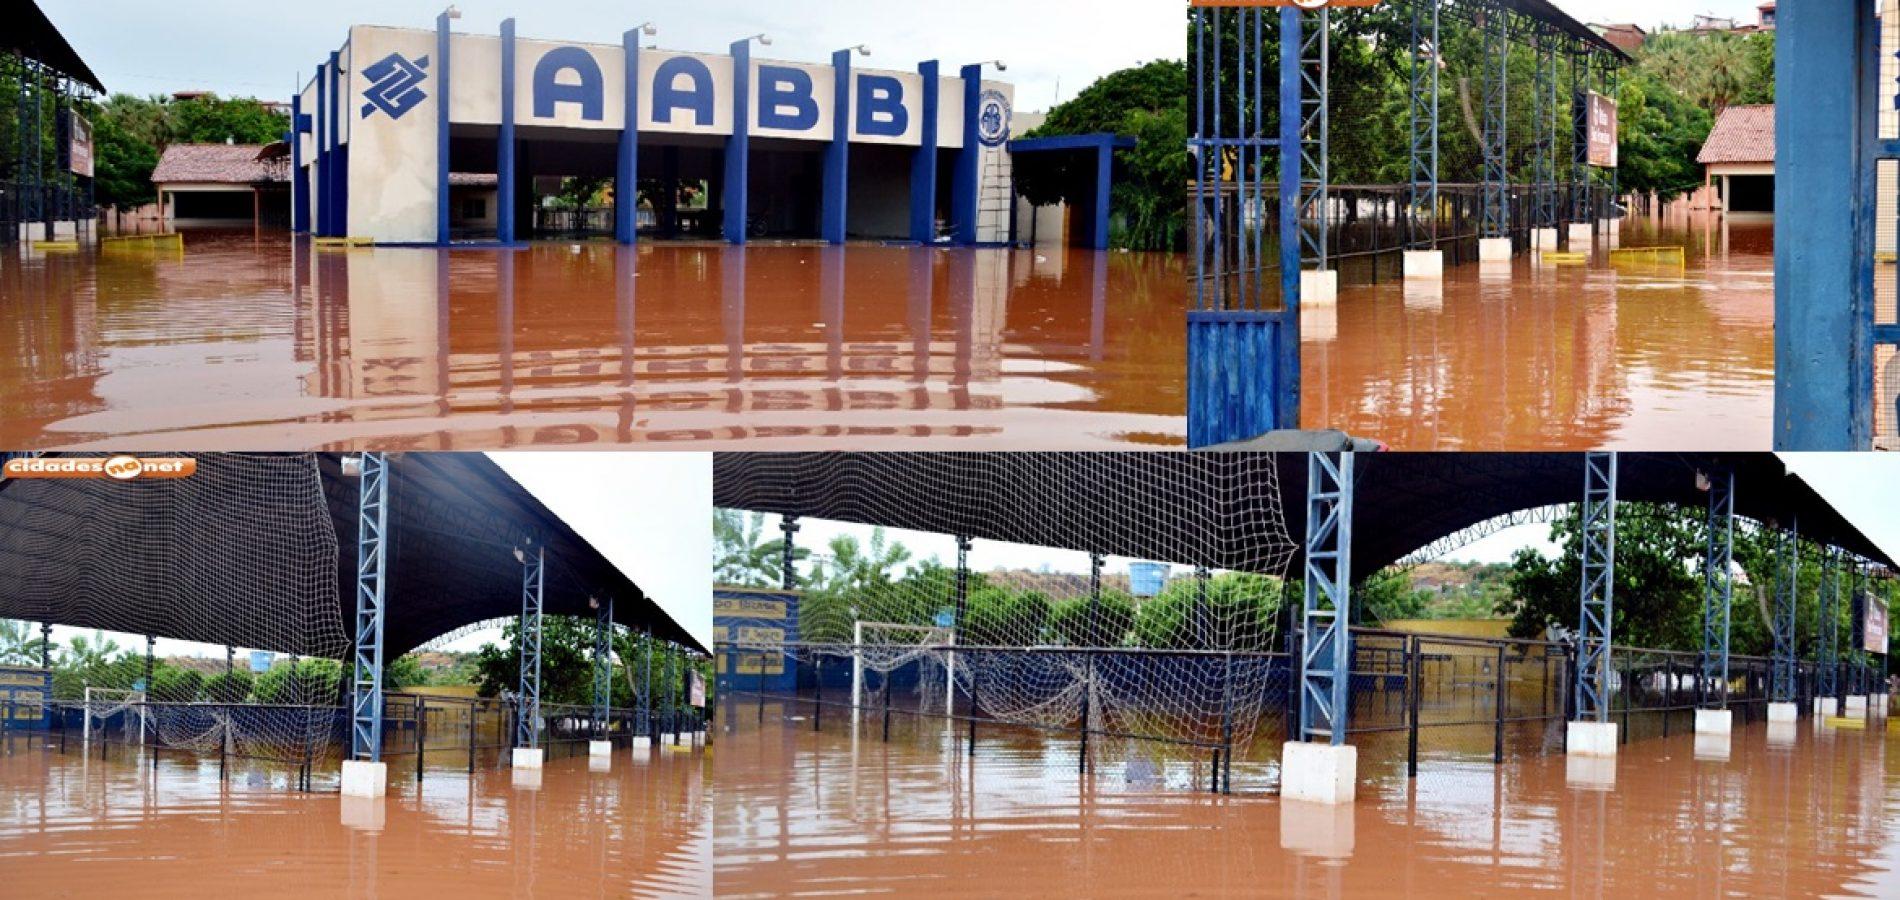 Enchentes provocam alagamento na AABB de Picos e causa prejuízo incalculável, aponta presidente; veja fotos